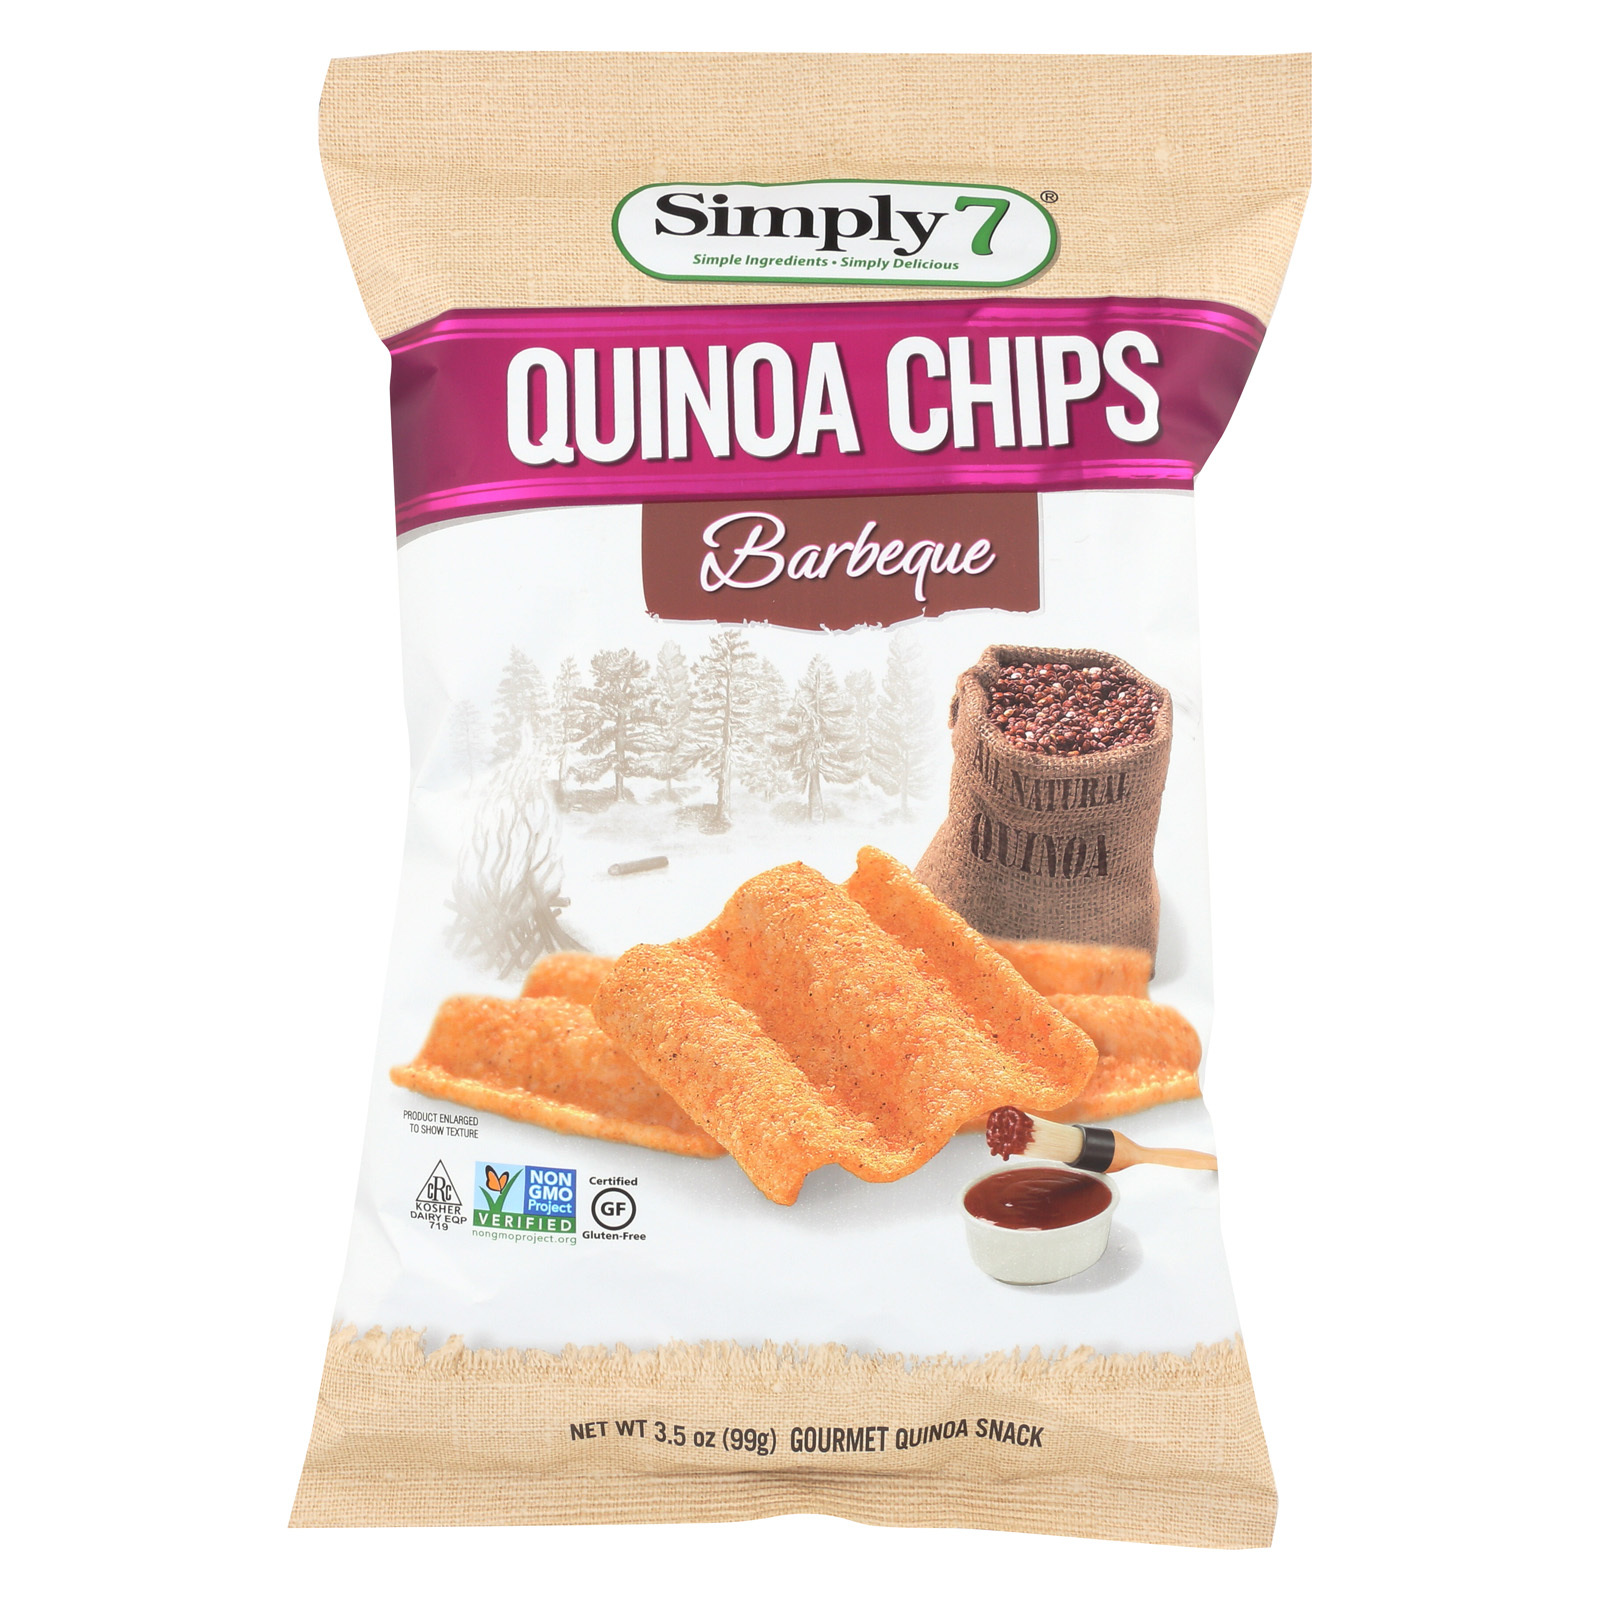 Simply 7 Quinoa Chips - Barbecue - Case of 12 - 3.5 oz.